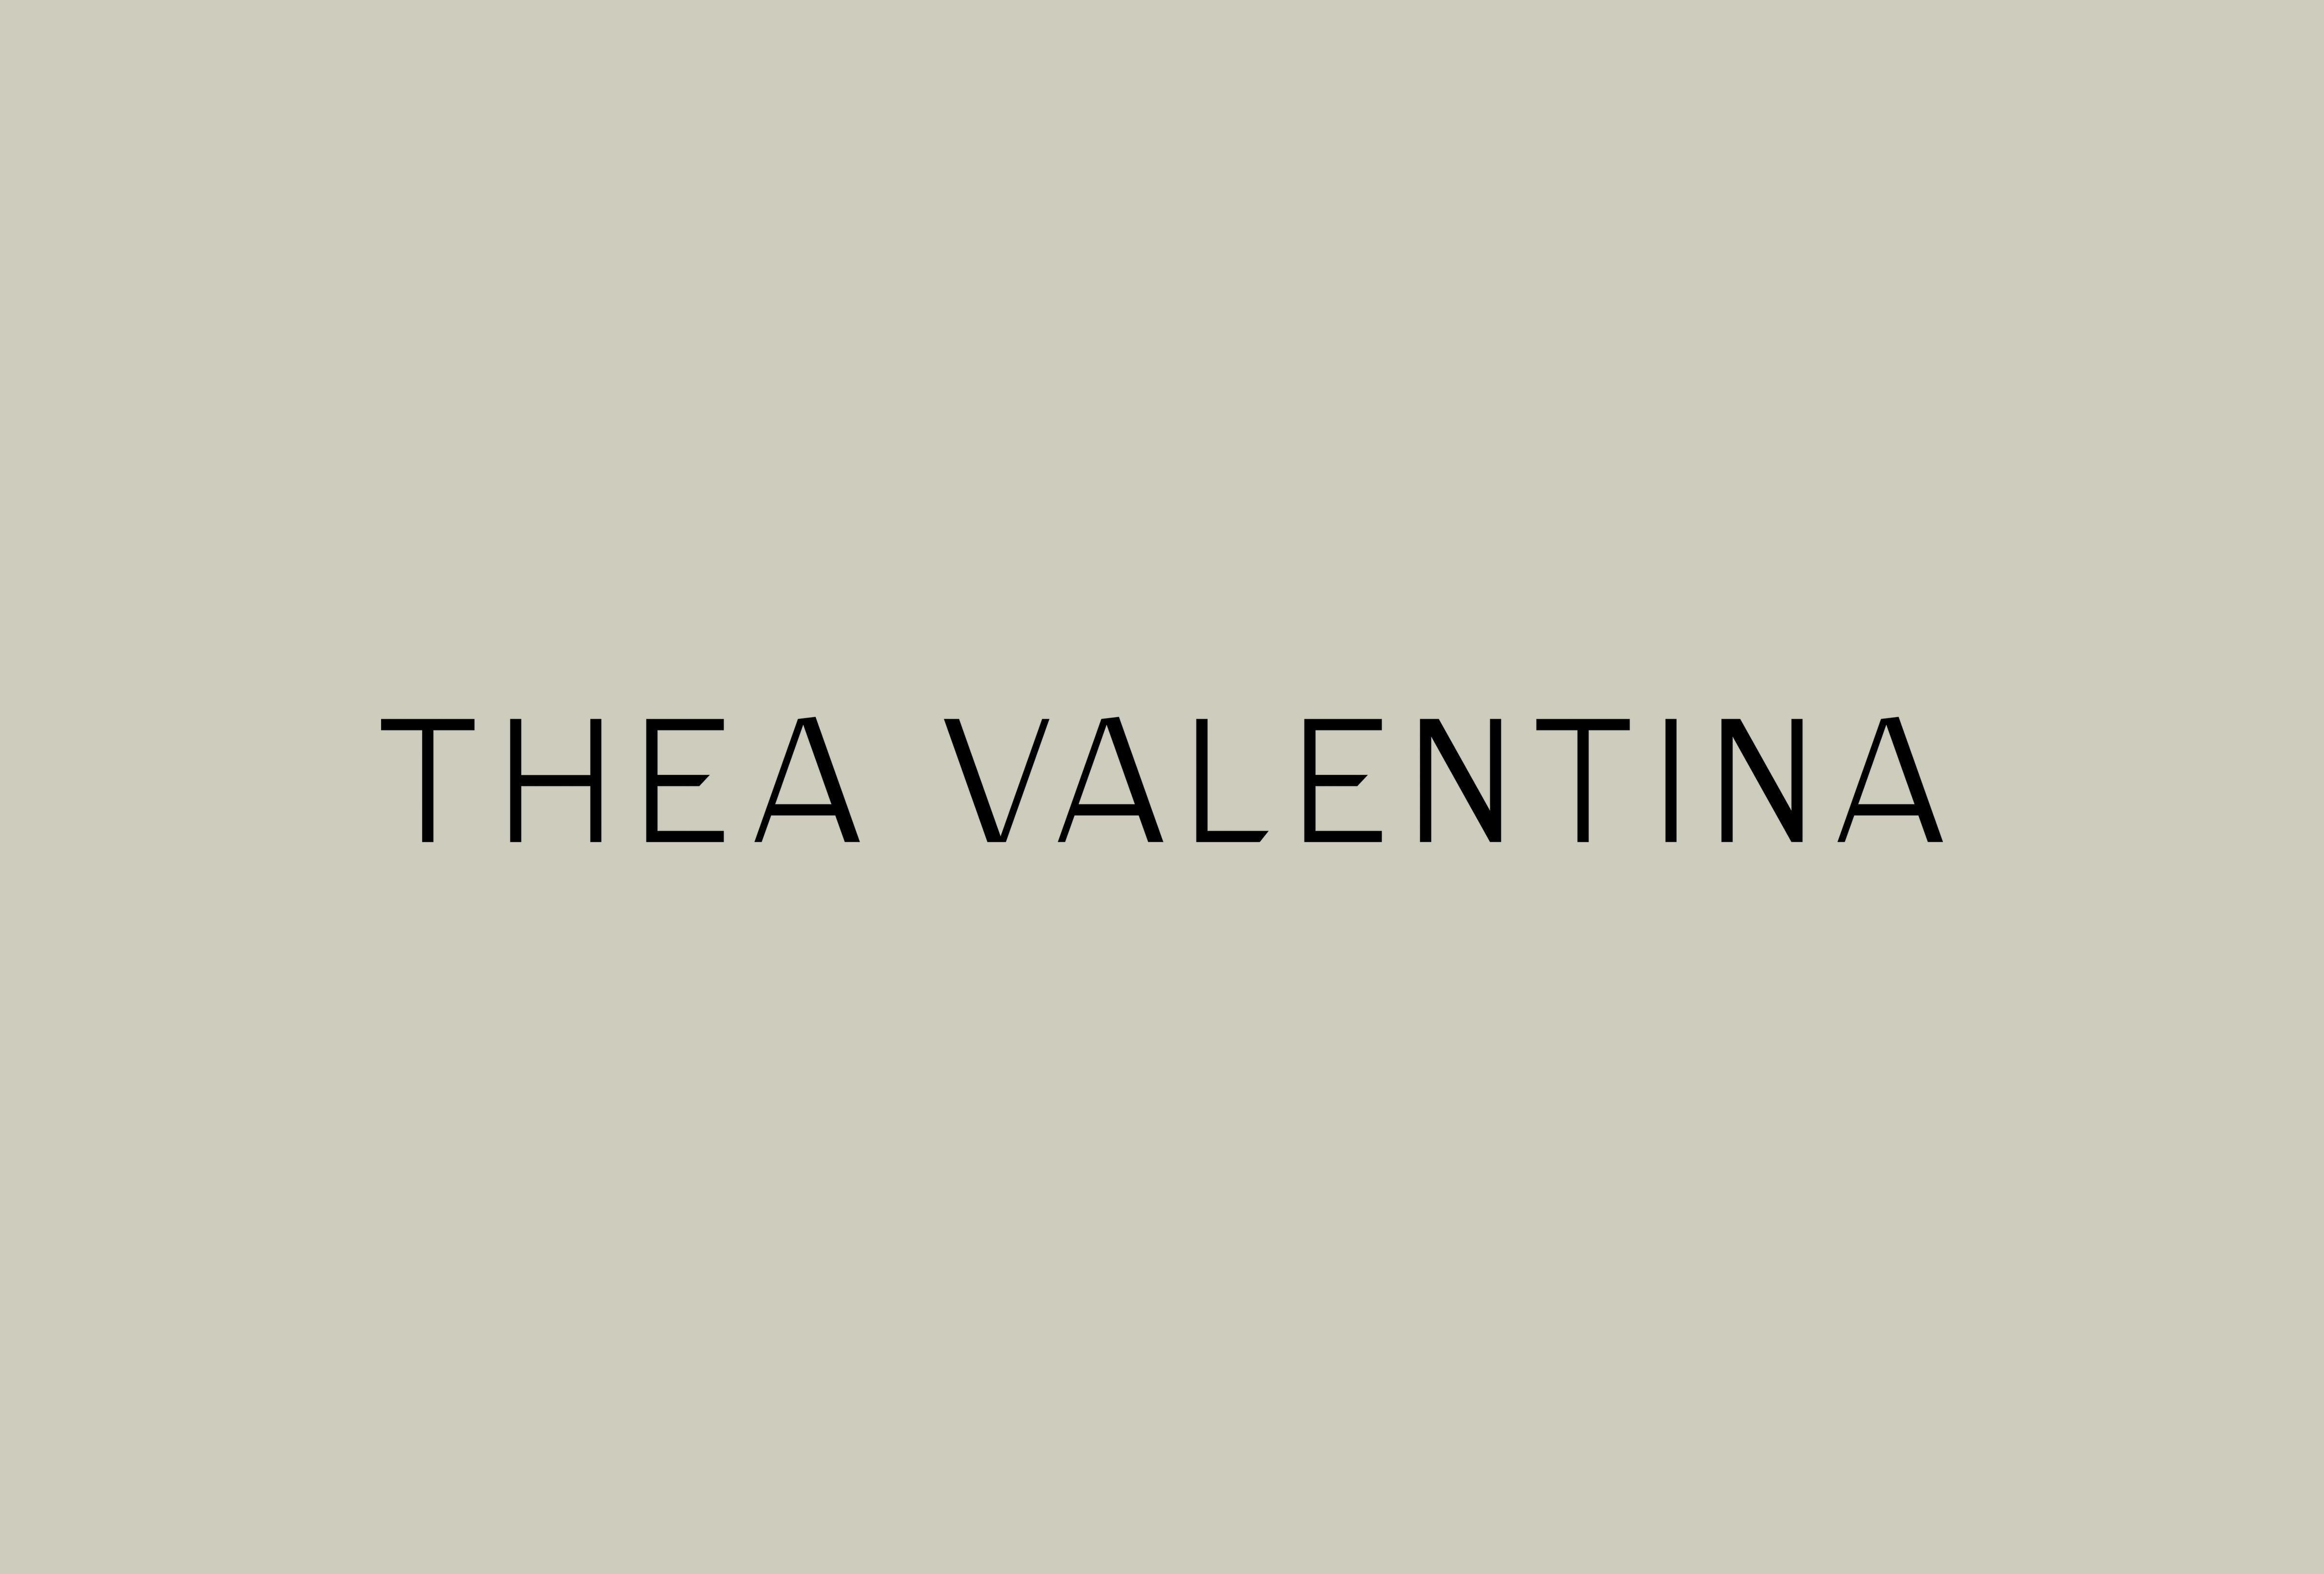 Thea Valentina